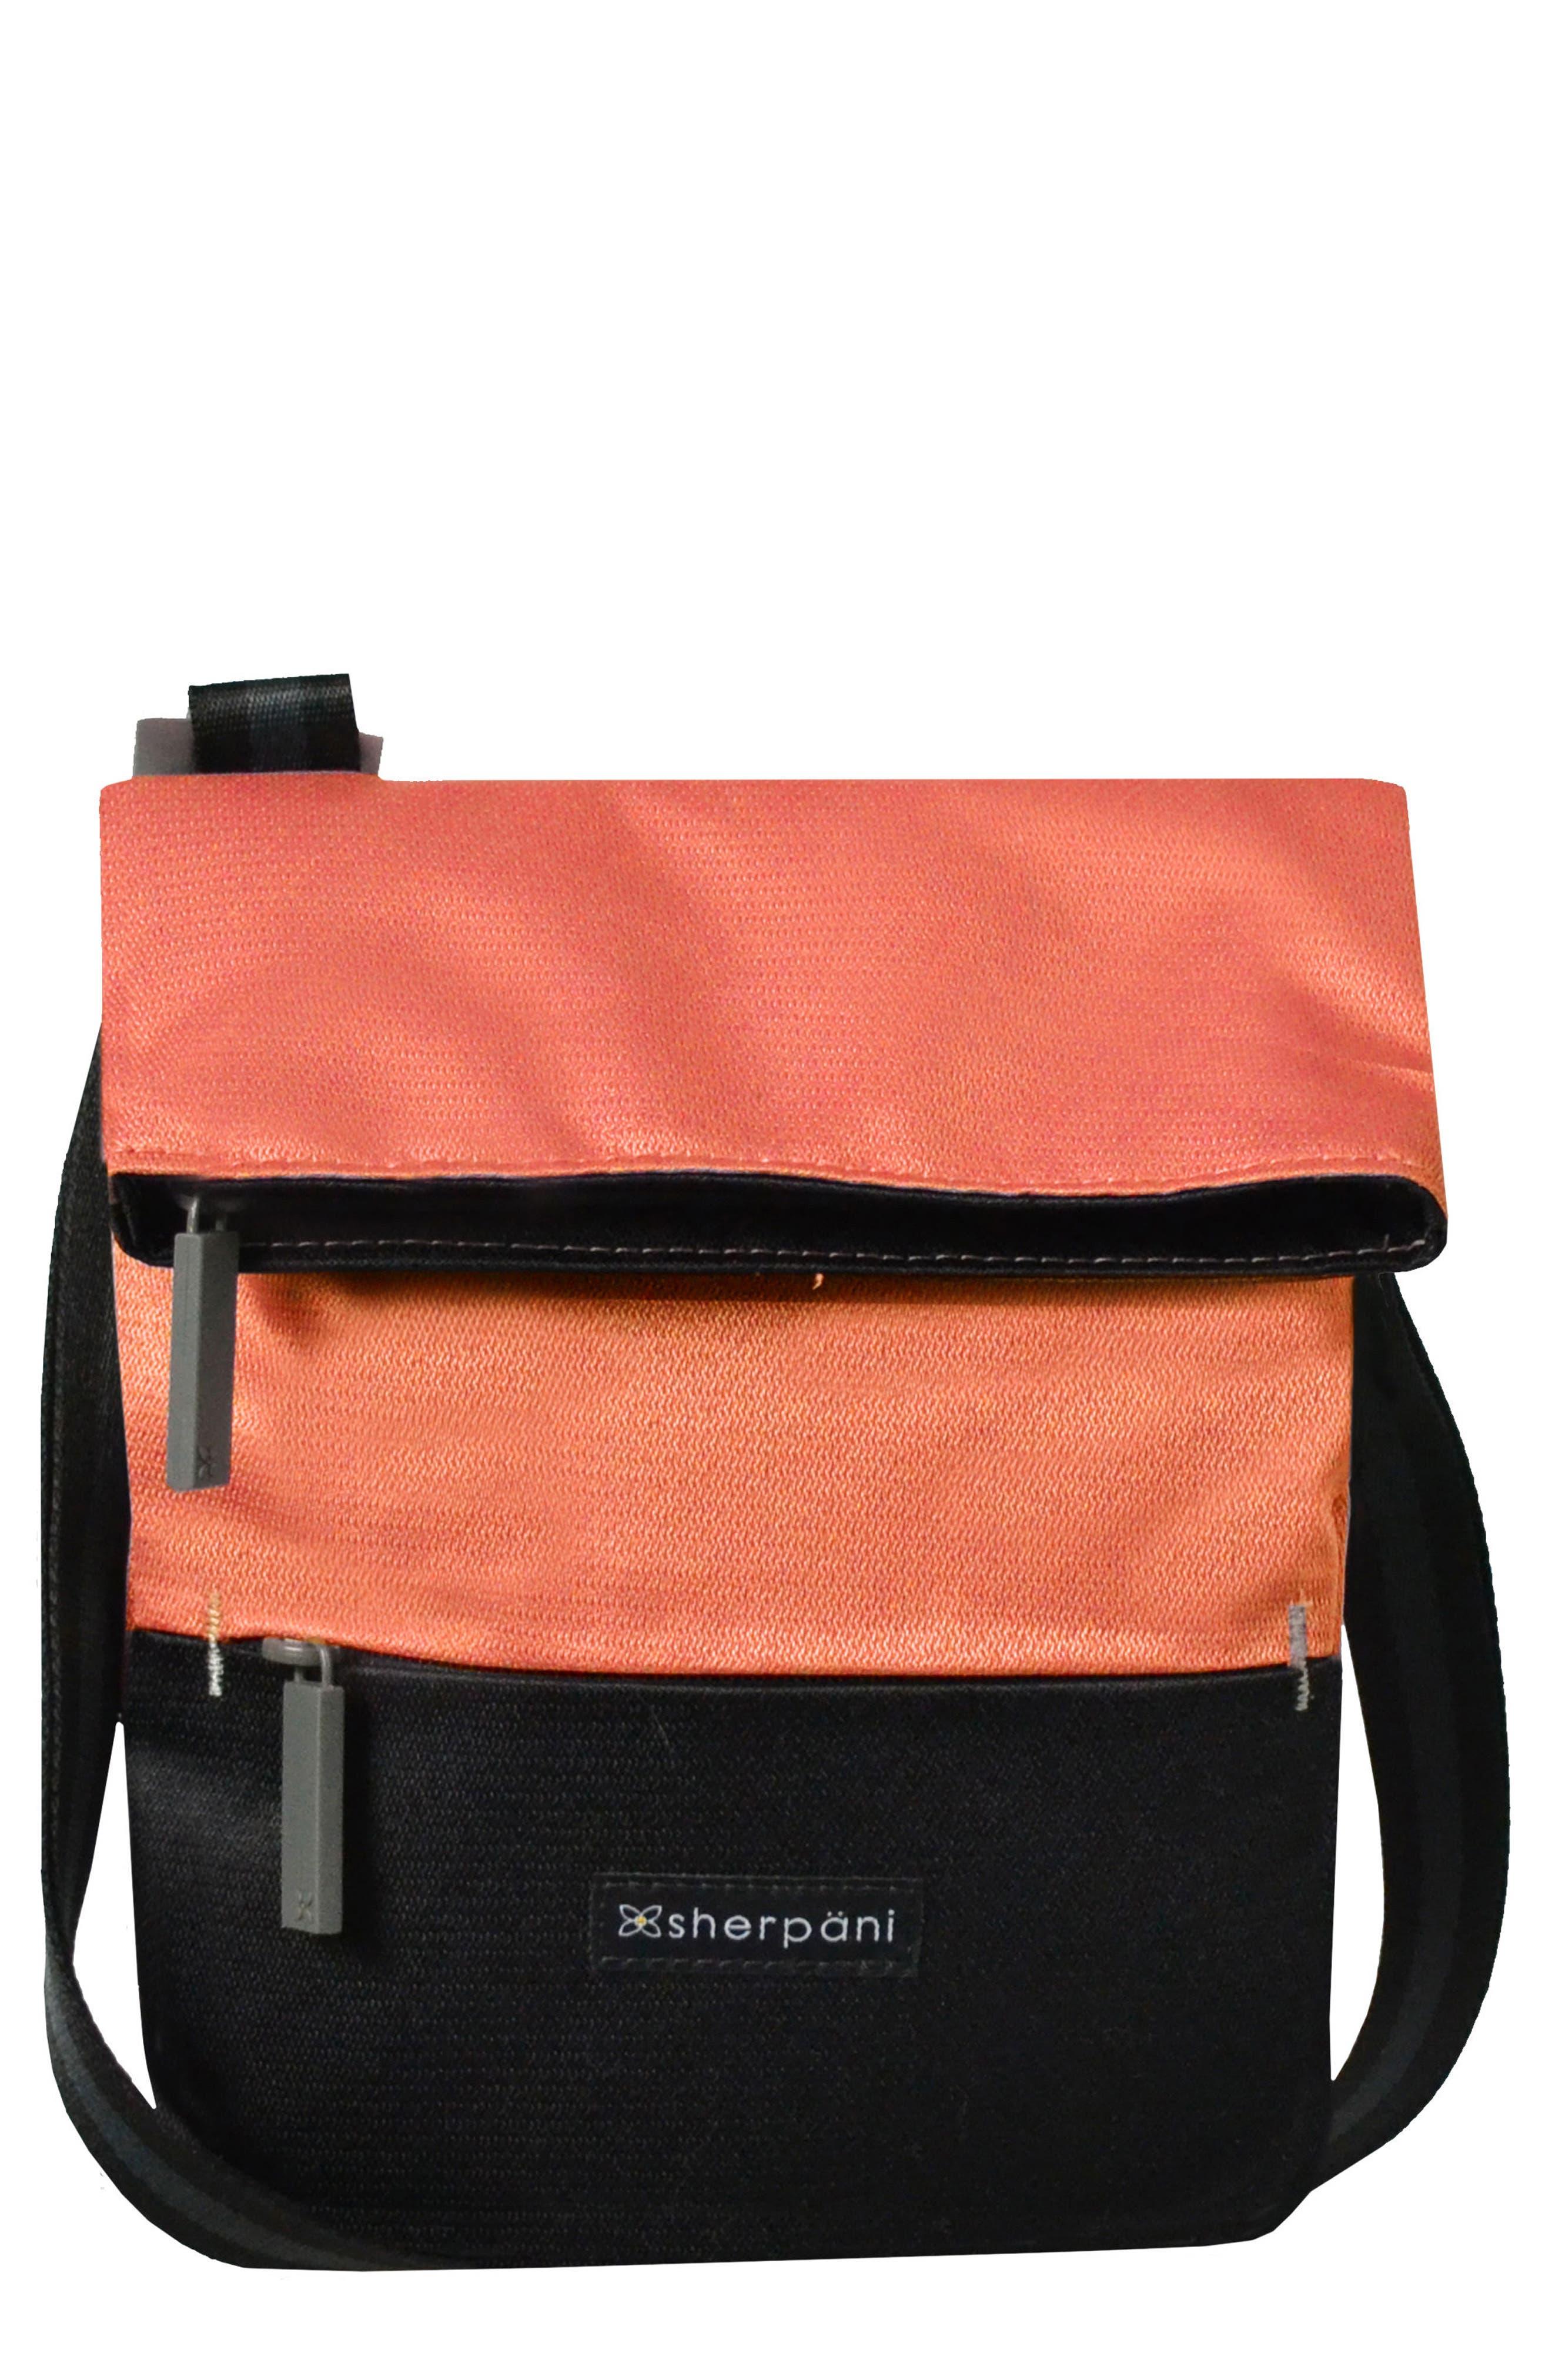 Alternate Image 1 Selected - Sherpani Small Pica Crossbody Bag